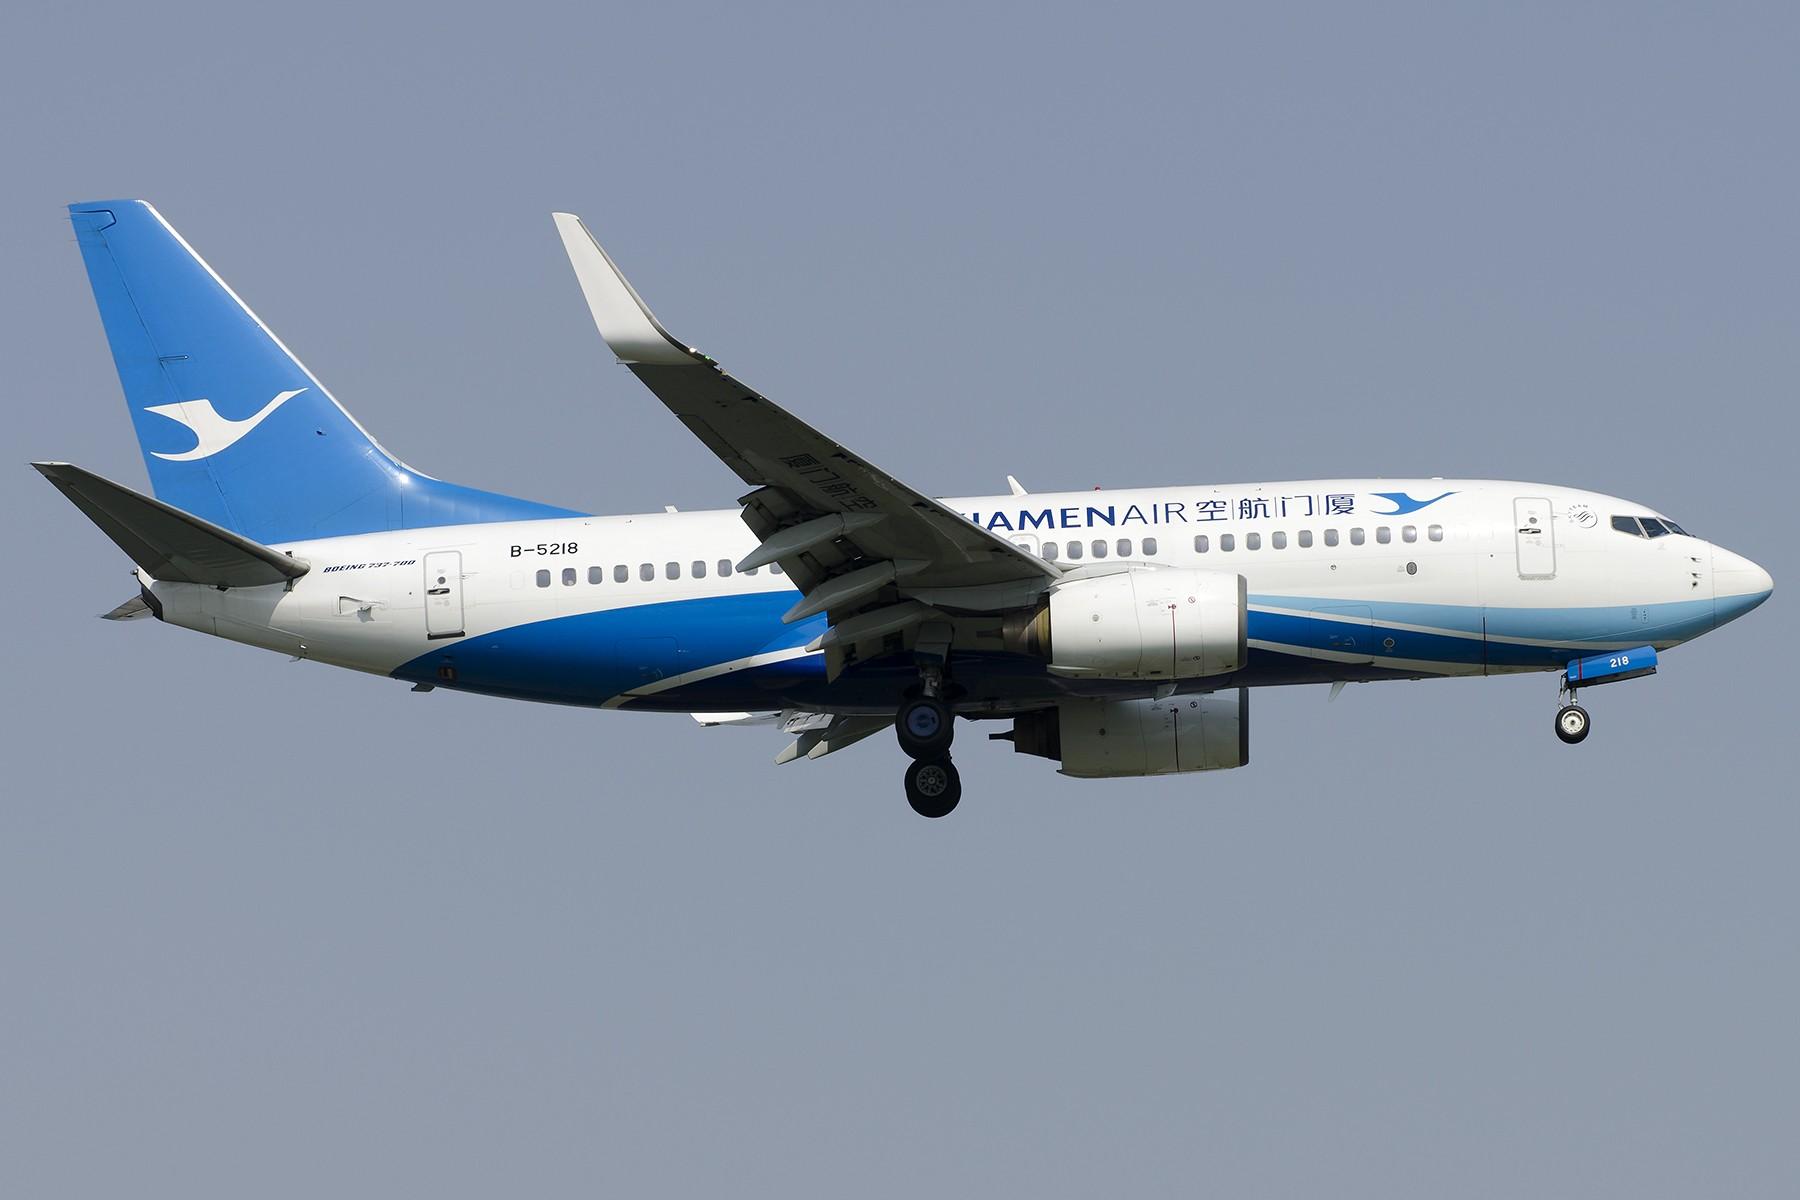 Re:[原创][原创]【SHA拍机*1800大图】4月拍的了,记得那天好货还挺多 BOEING 737-700 B-5218 中国上海虹桥国际机场